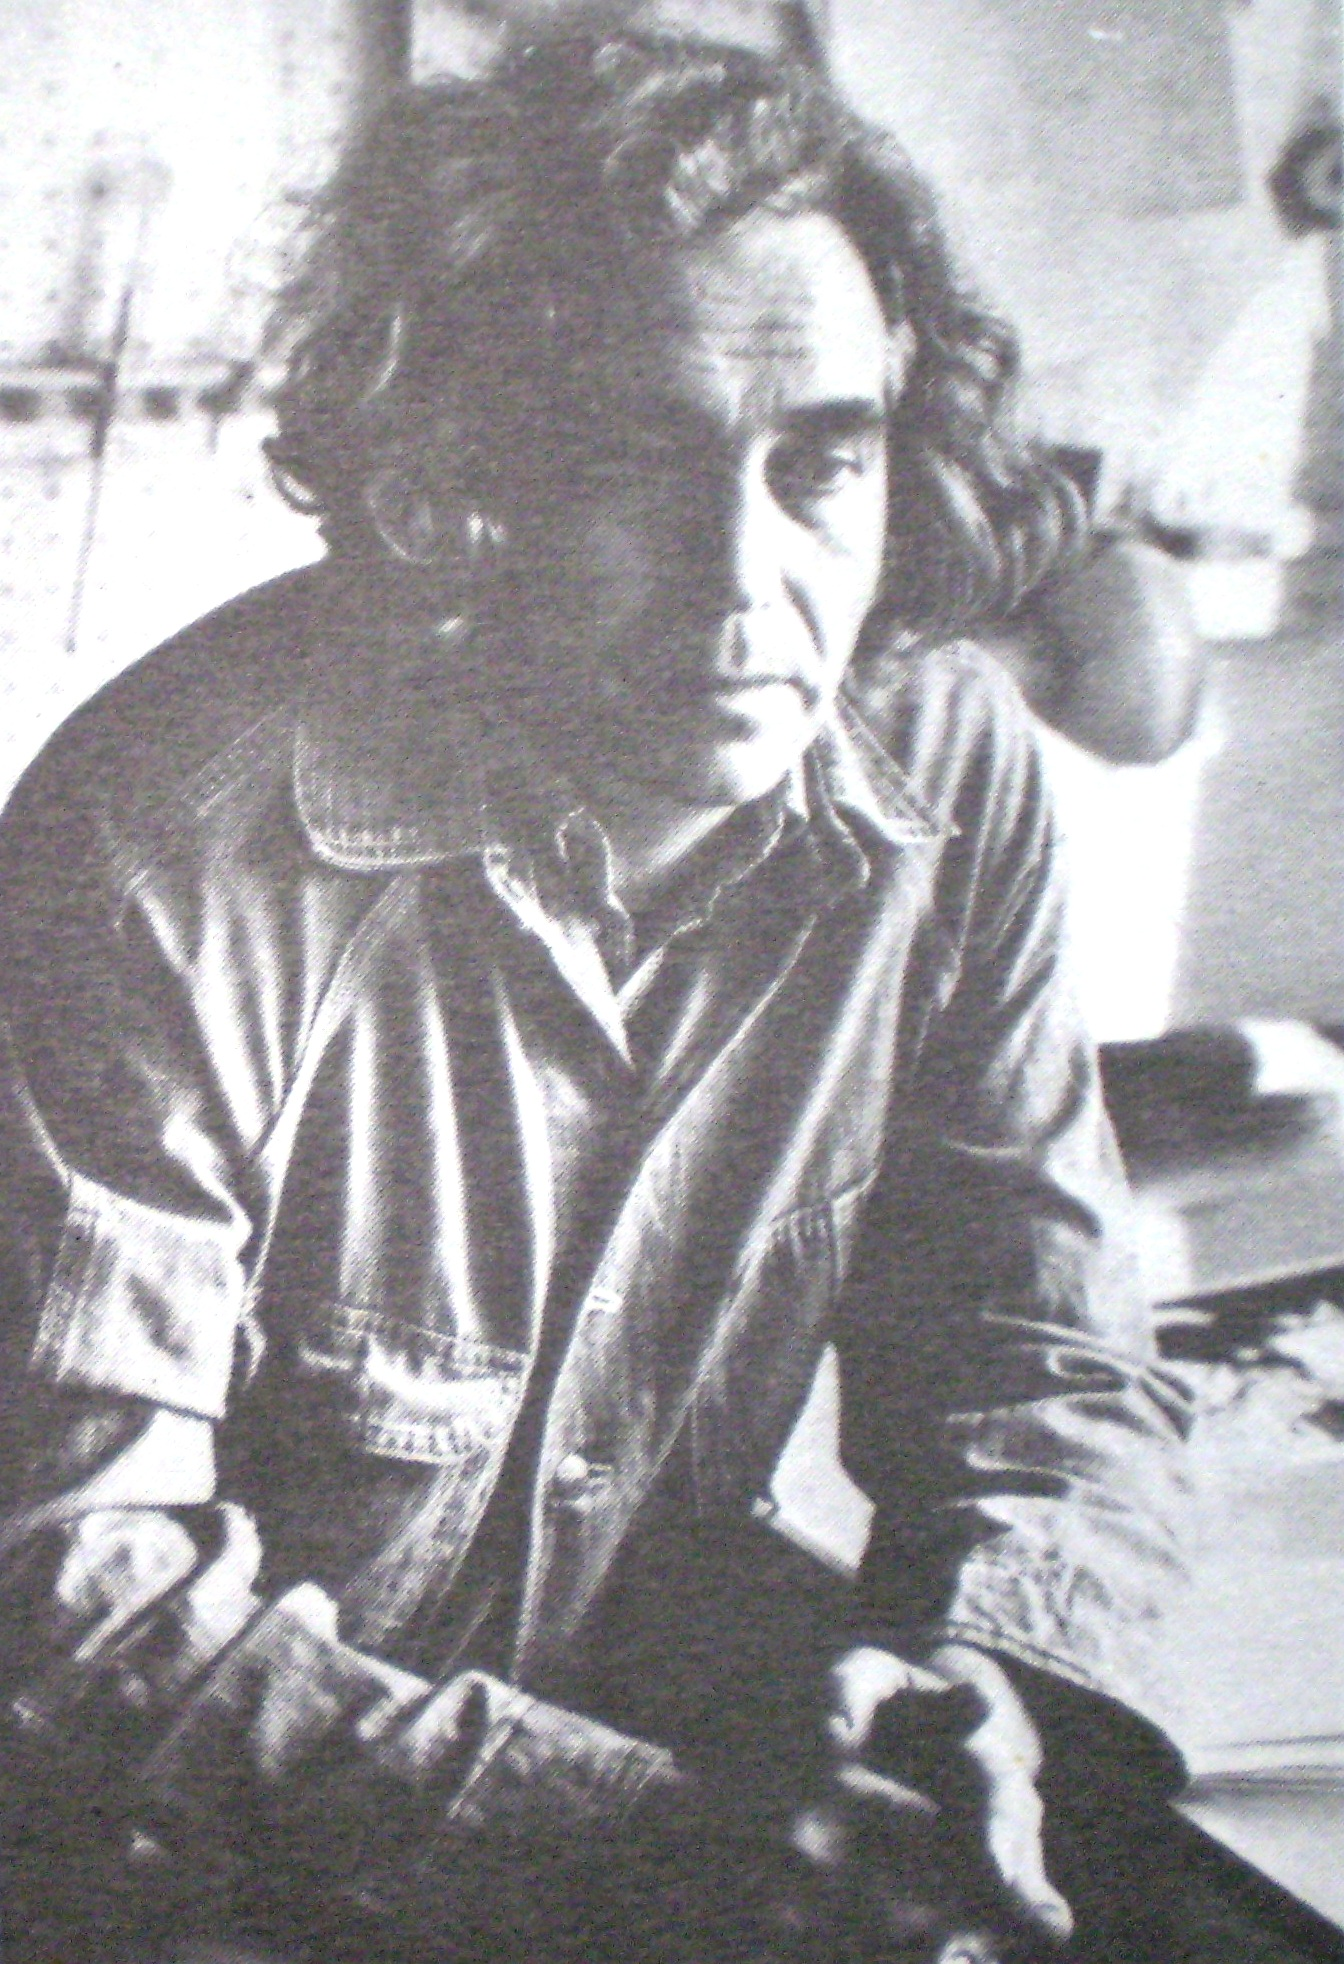 Carlos Alonso (1979)